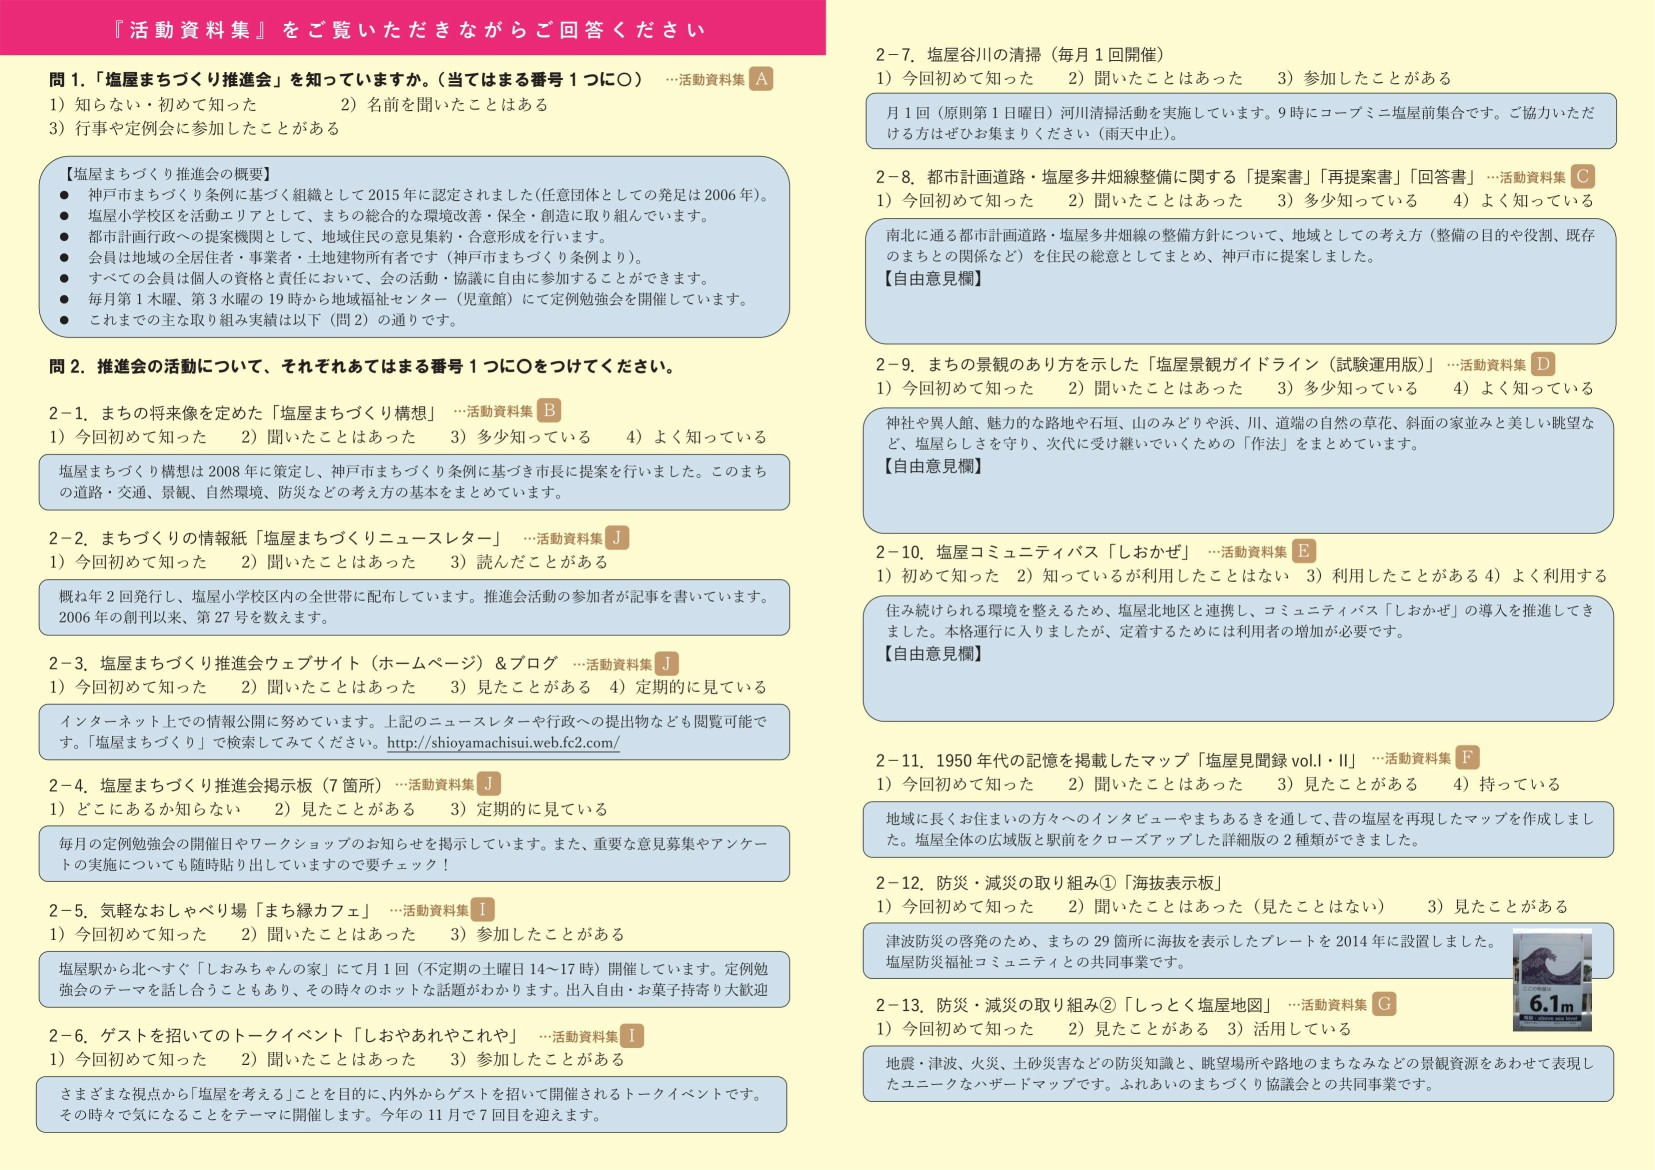 questionnaire_02s.jpg